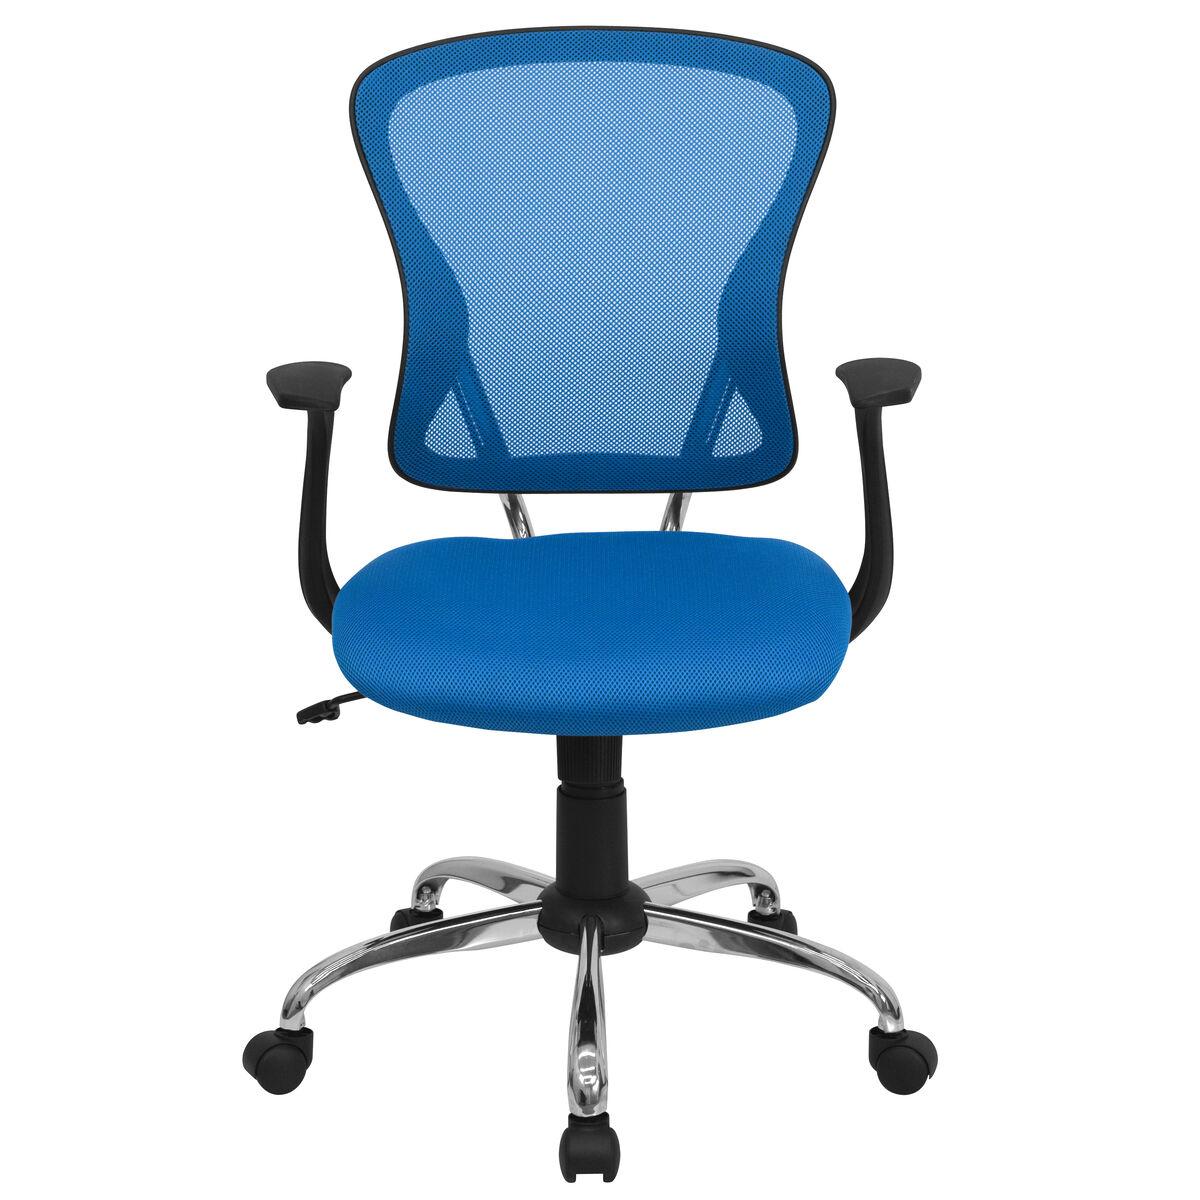 Flash furniture h 8369f bl gg for H furniture ww chair